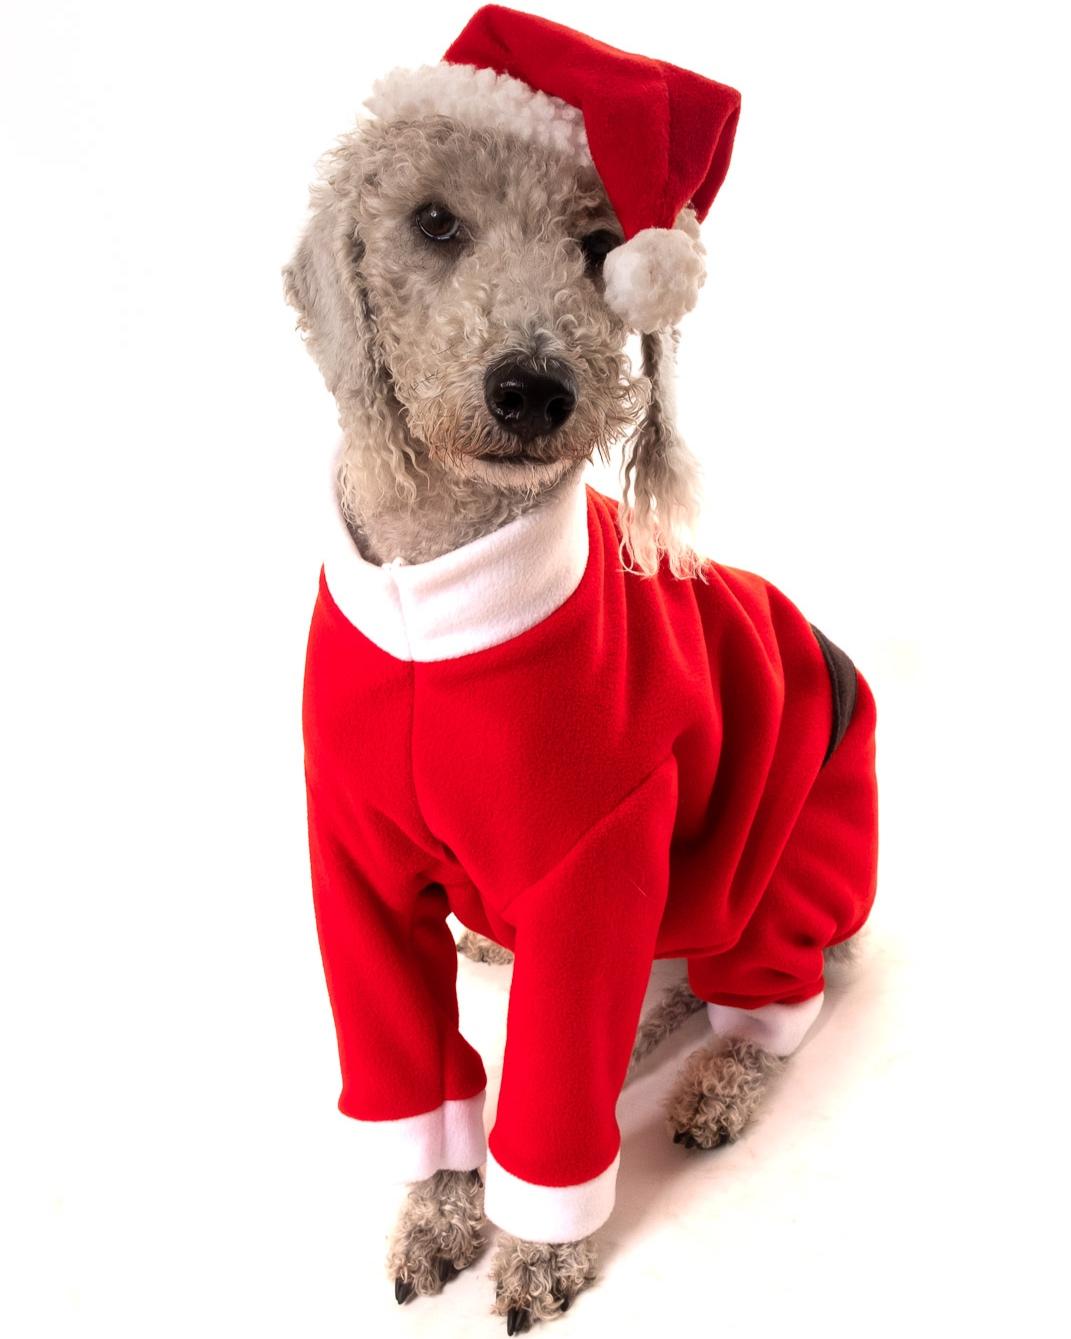 Bedlington Terrier in a Santa costume